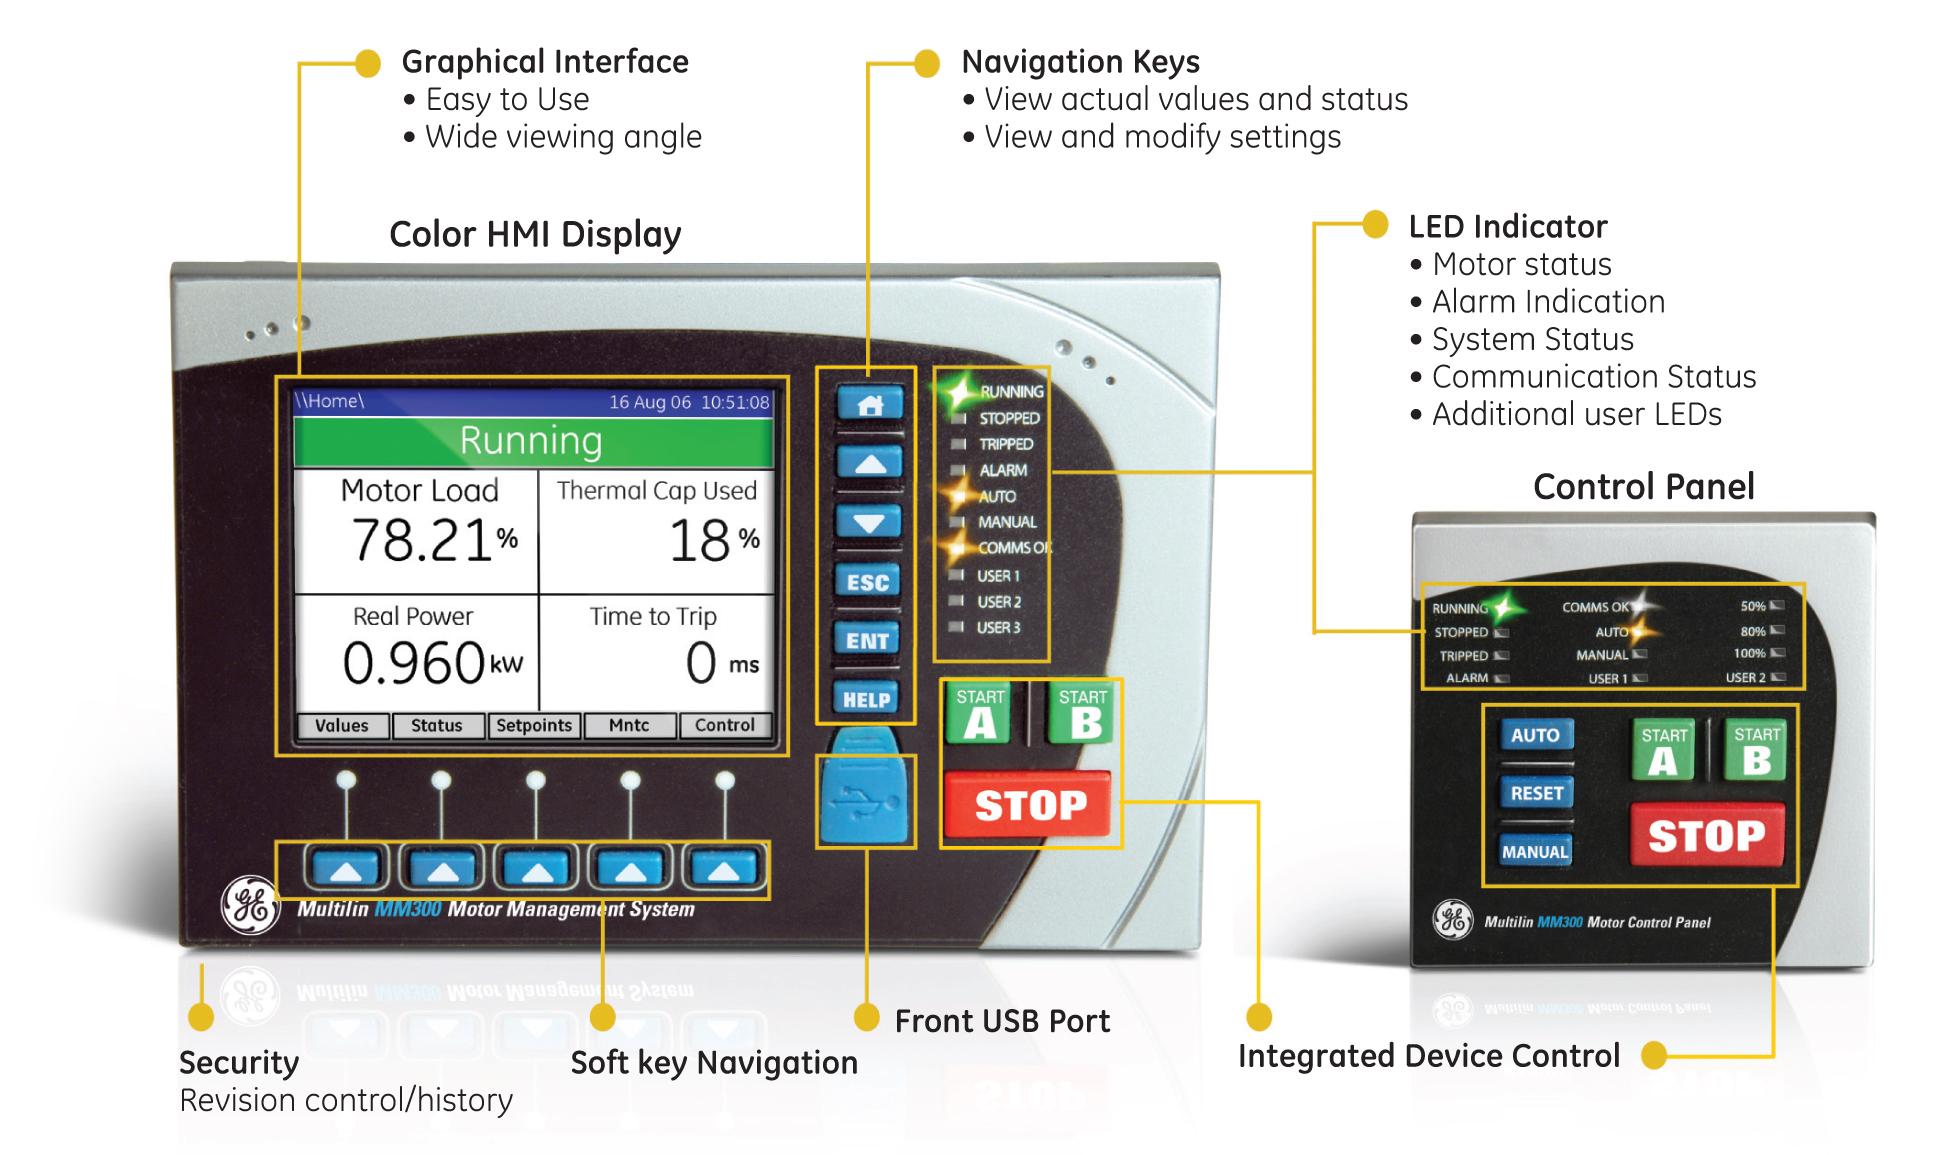 ge 469 multilin menu diagram example electrical wiring diagram u2022 rh huntervalleyhotels co GE Multilin Relays GE Multilin SR750 Manual